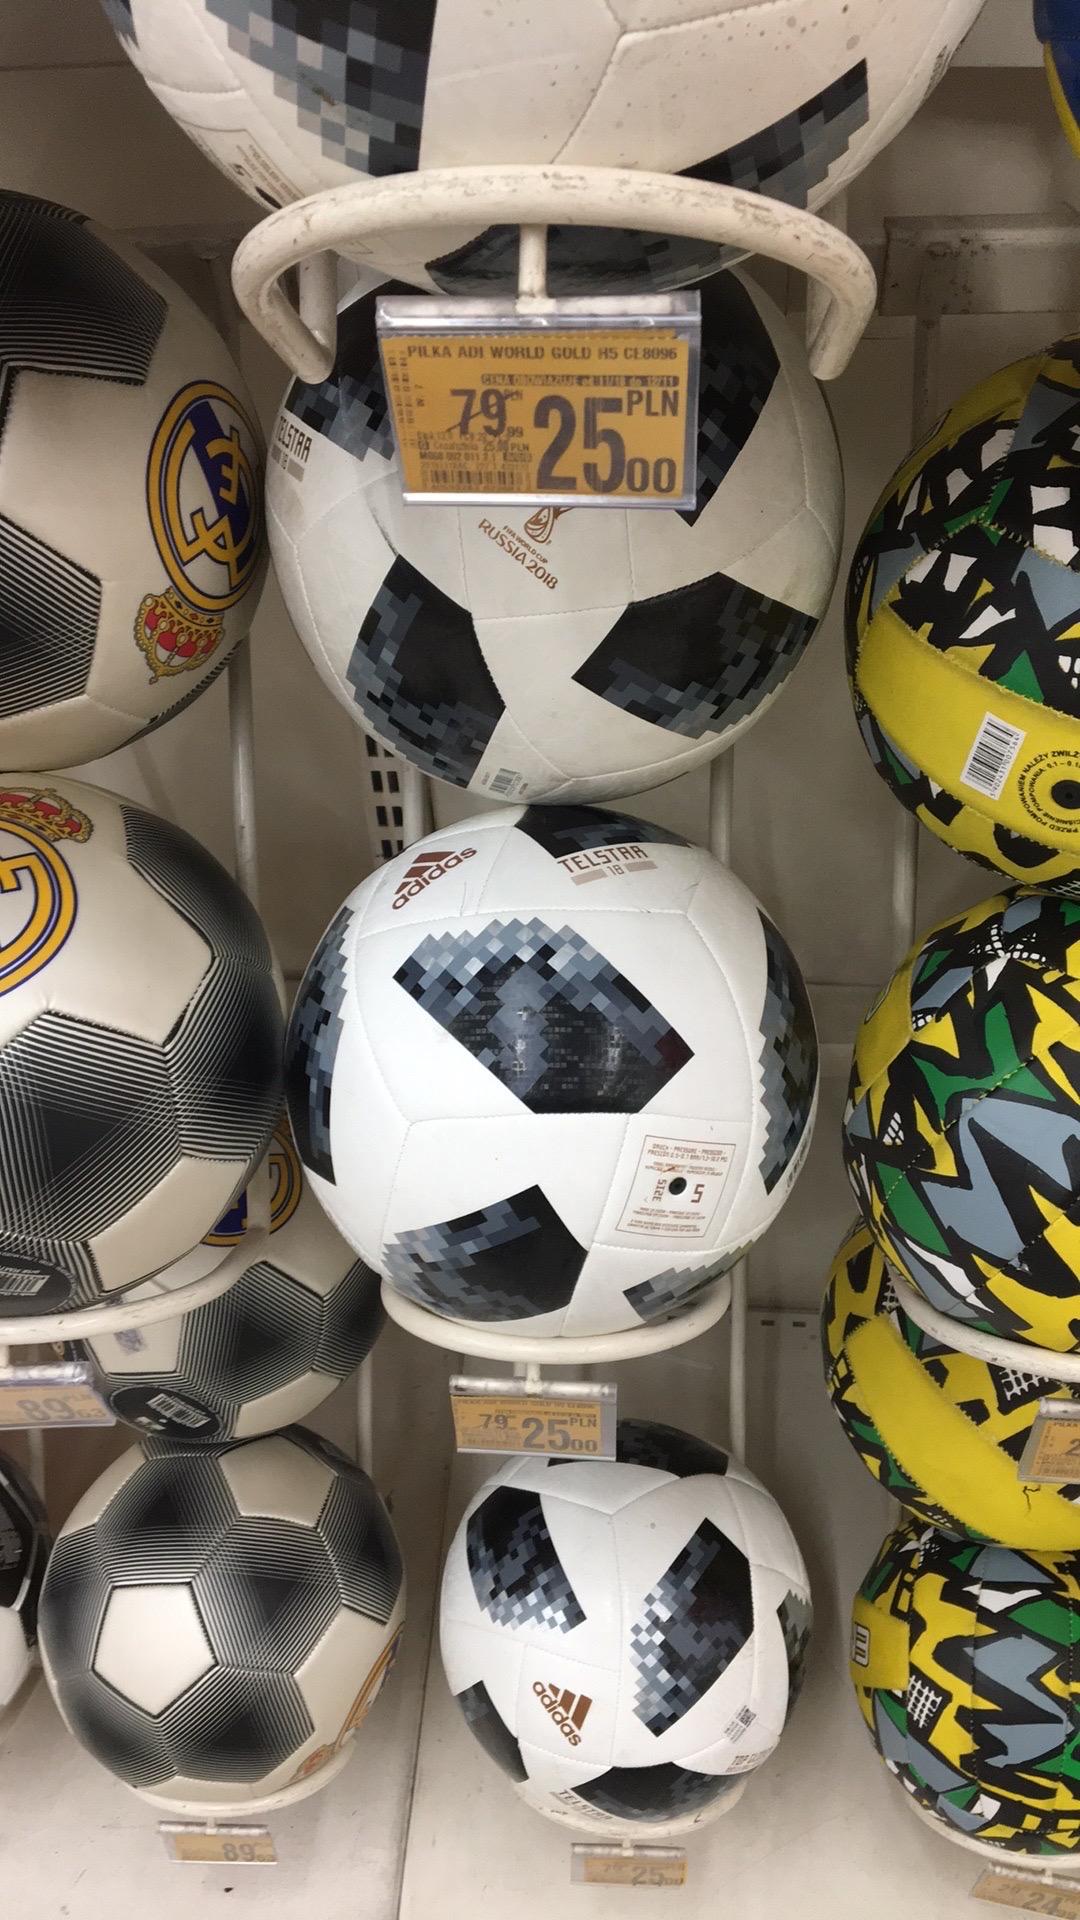 Piłka Adidas TELSTAR World Cup 2018 @Auchan